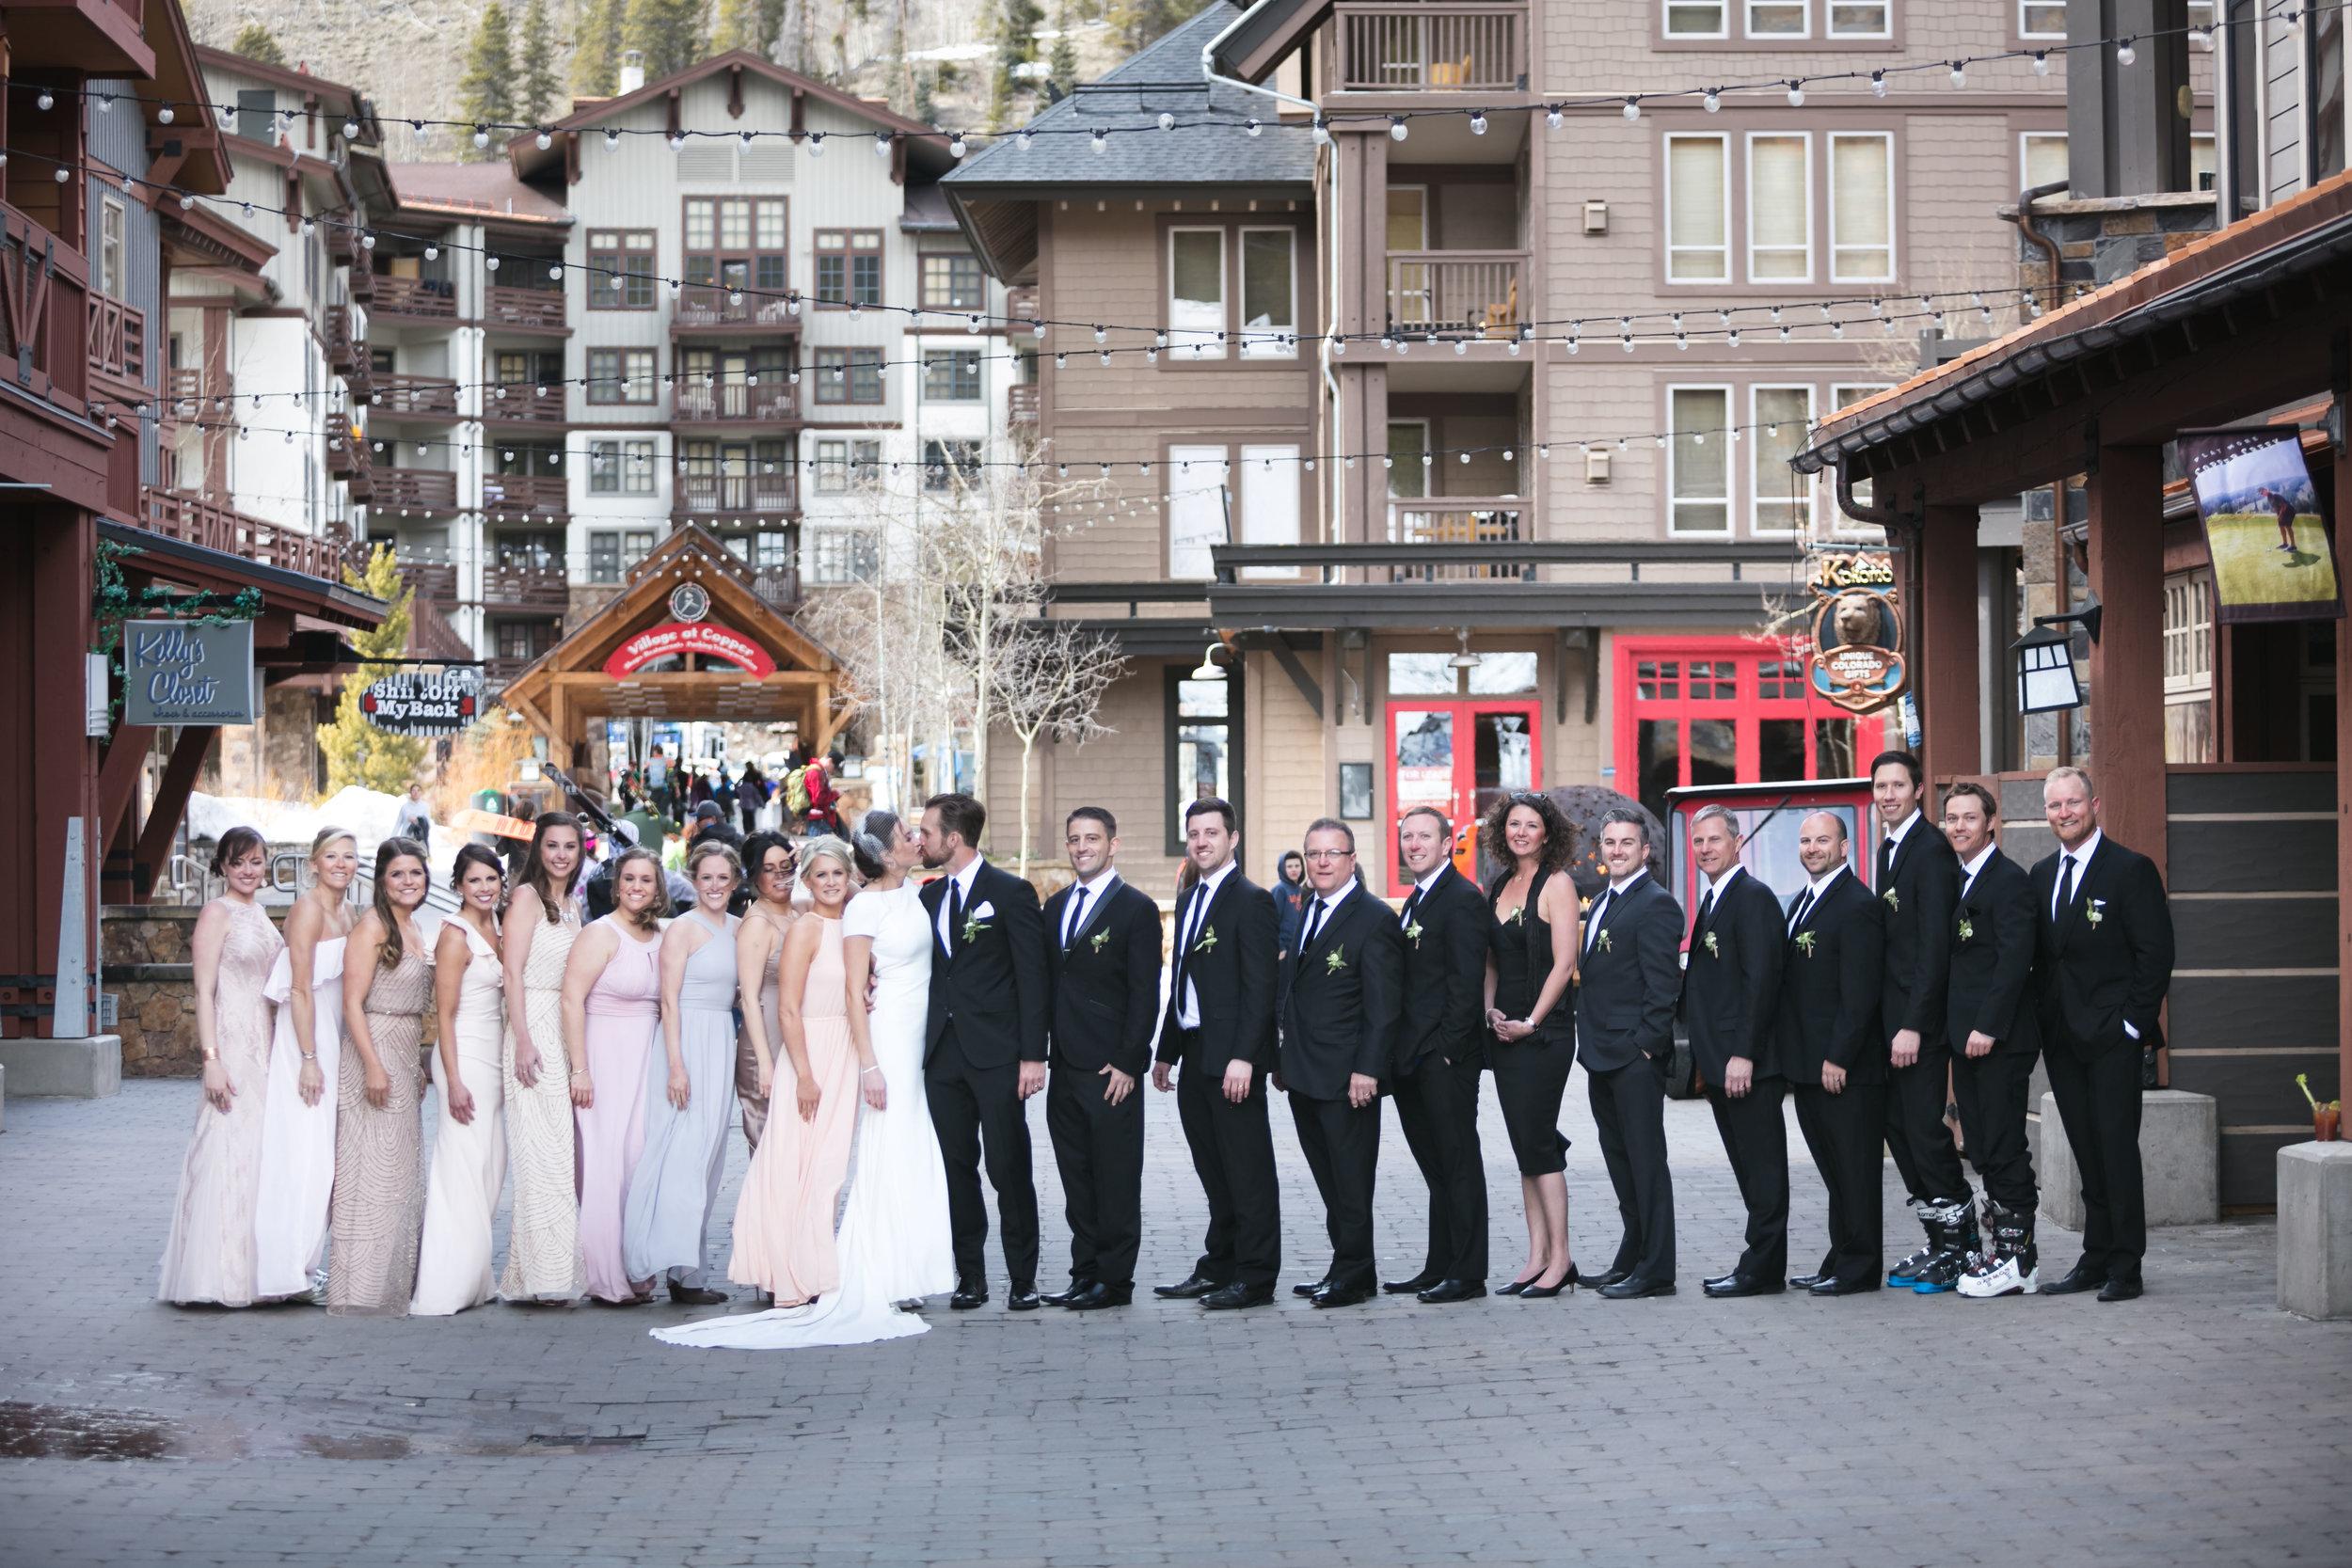 vild-photography-photographer-colorado-intimate-wedding-adventure-Stephanie- Adam-436.jpg